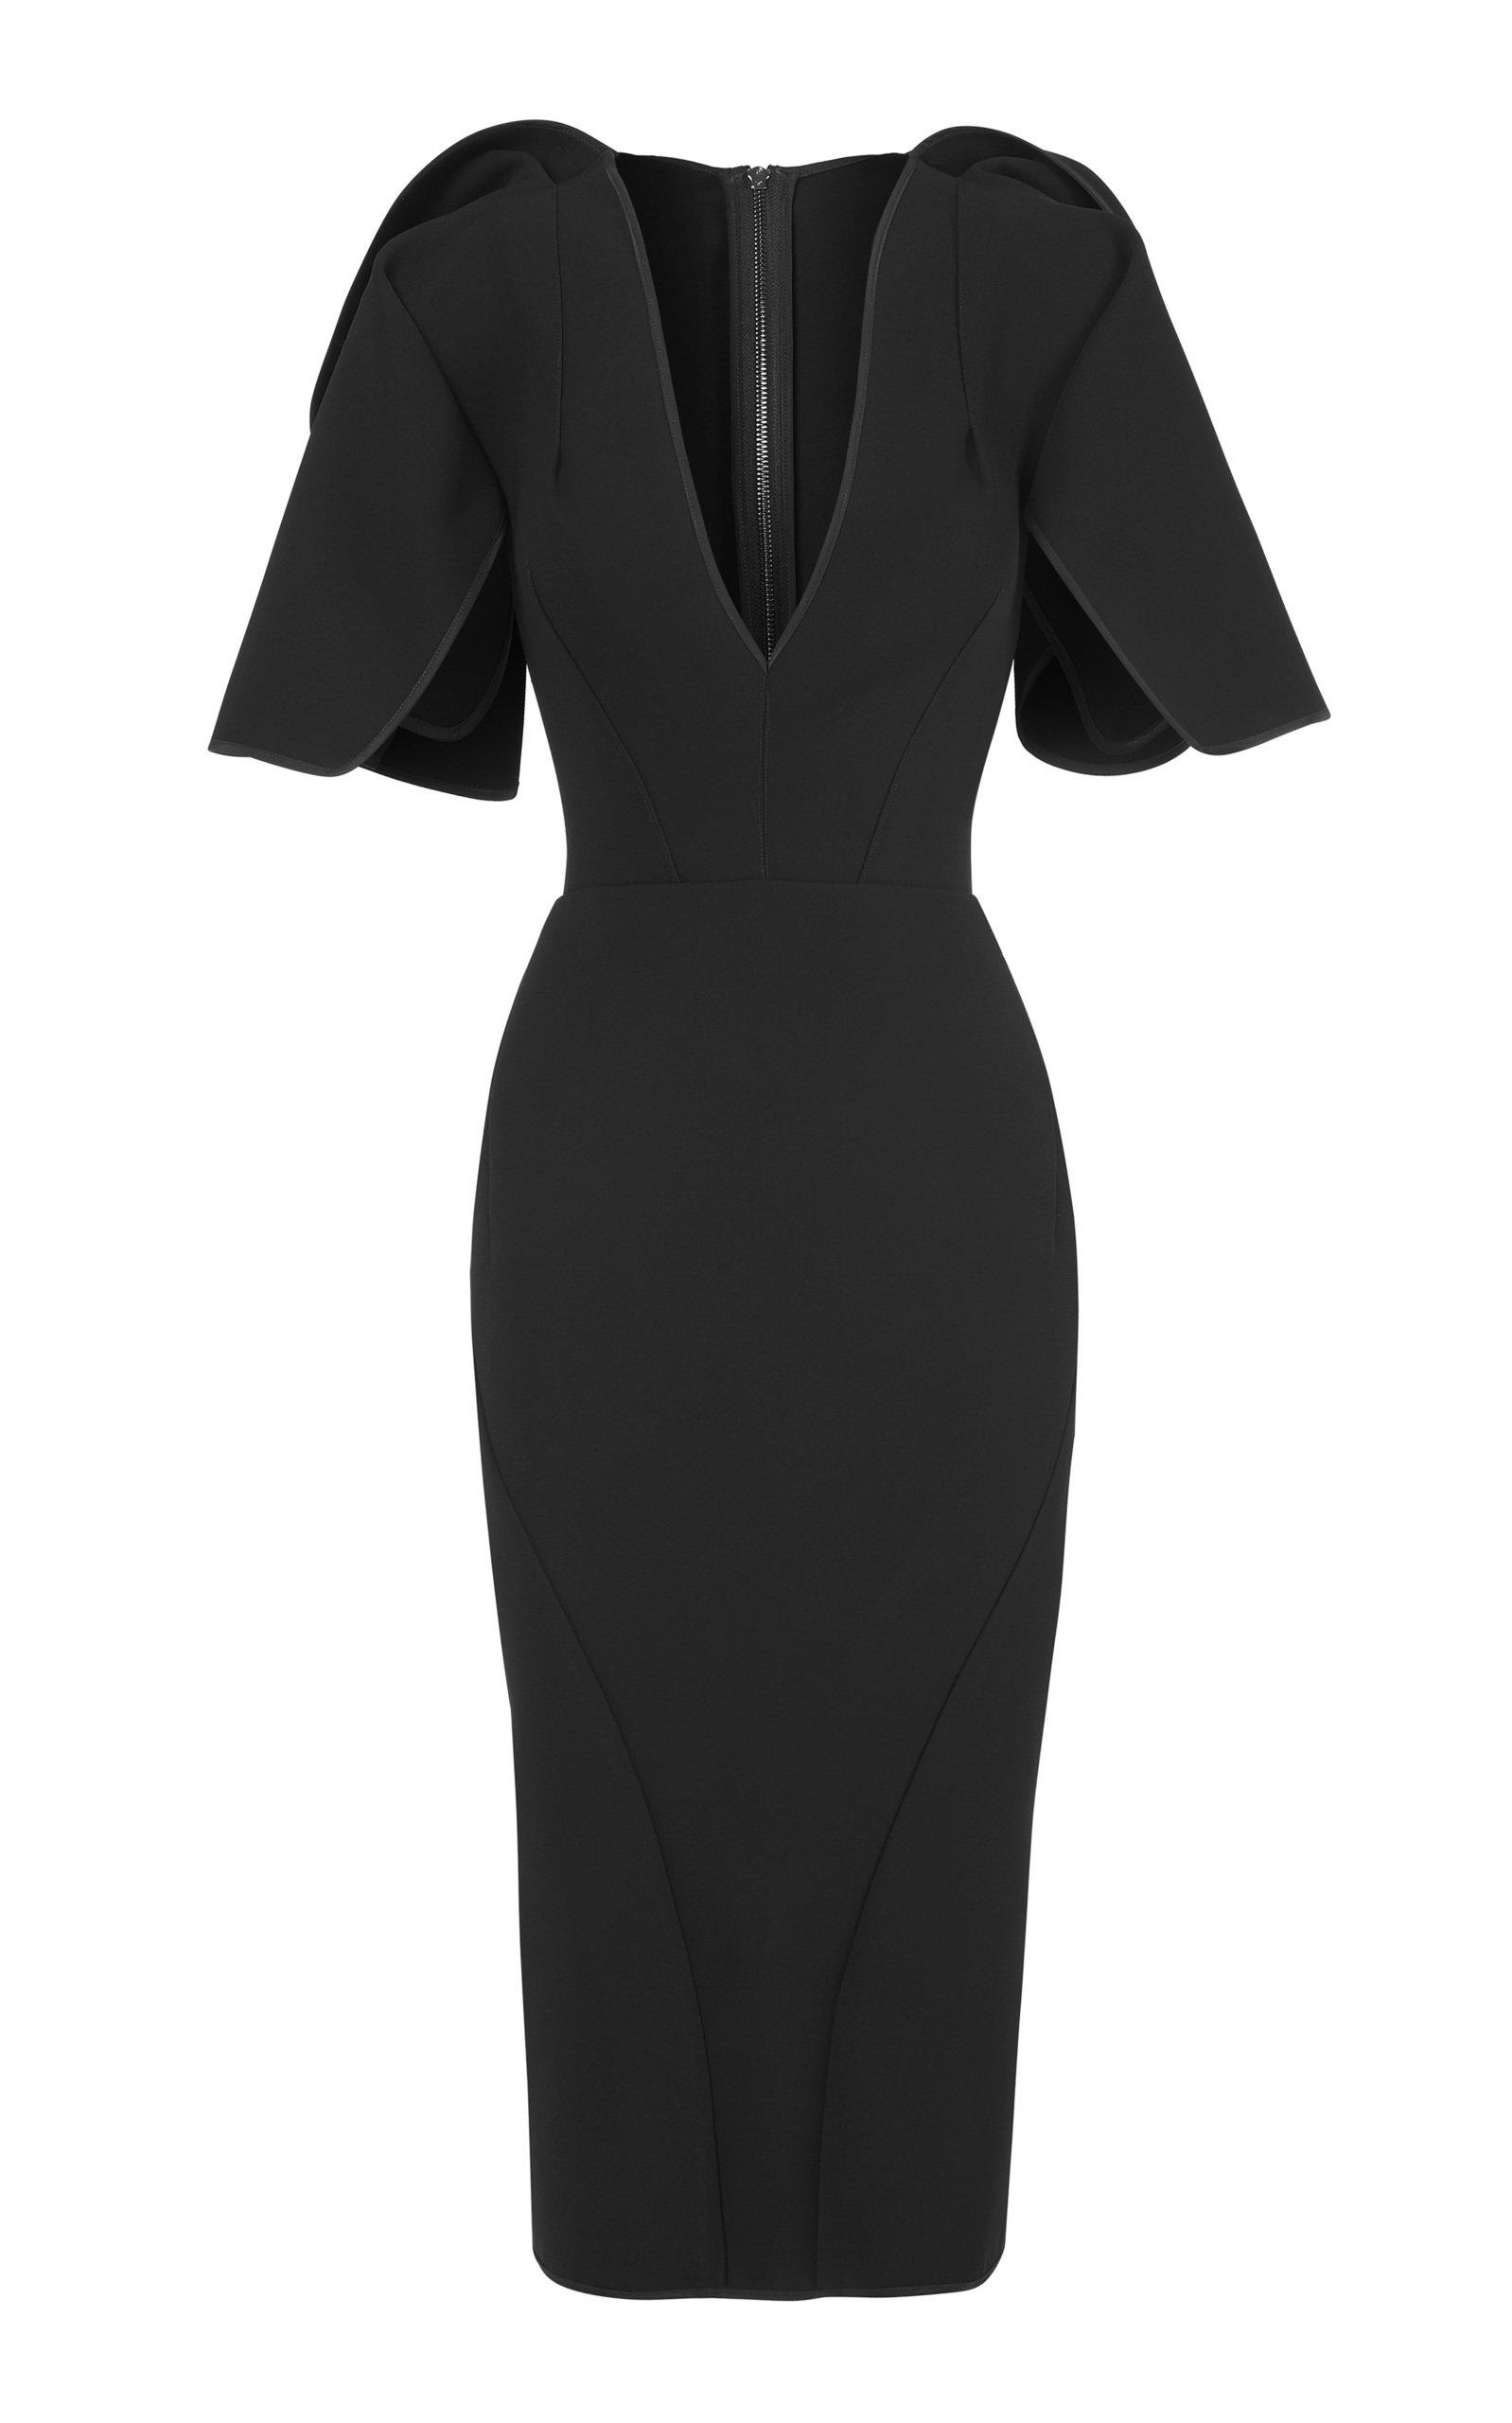 Buy Maticevski Vowed Cady Midi Dress online, shop Maticevski at the best price